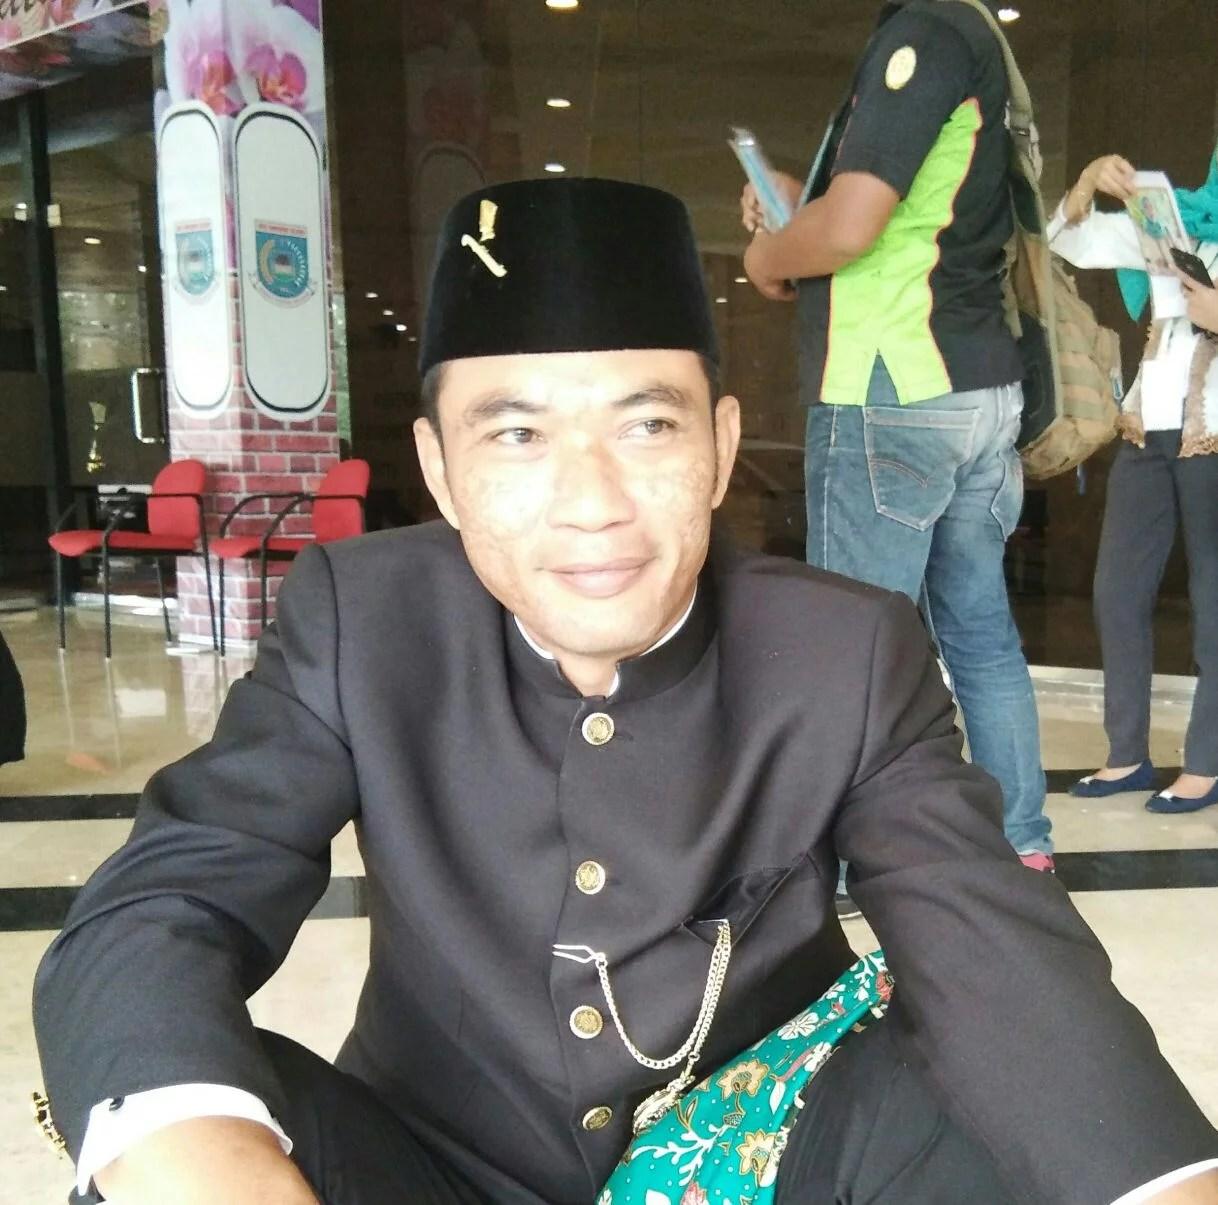 Refleksi 9 Tahun Tangsel, Wakil Ketua I DPRD: Masyarakat Tangsel Kurang Mengkritik Pemerintah